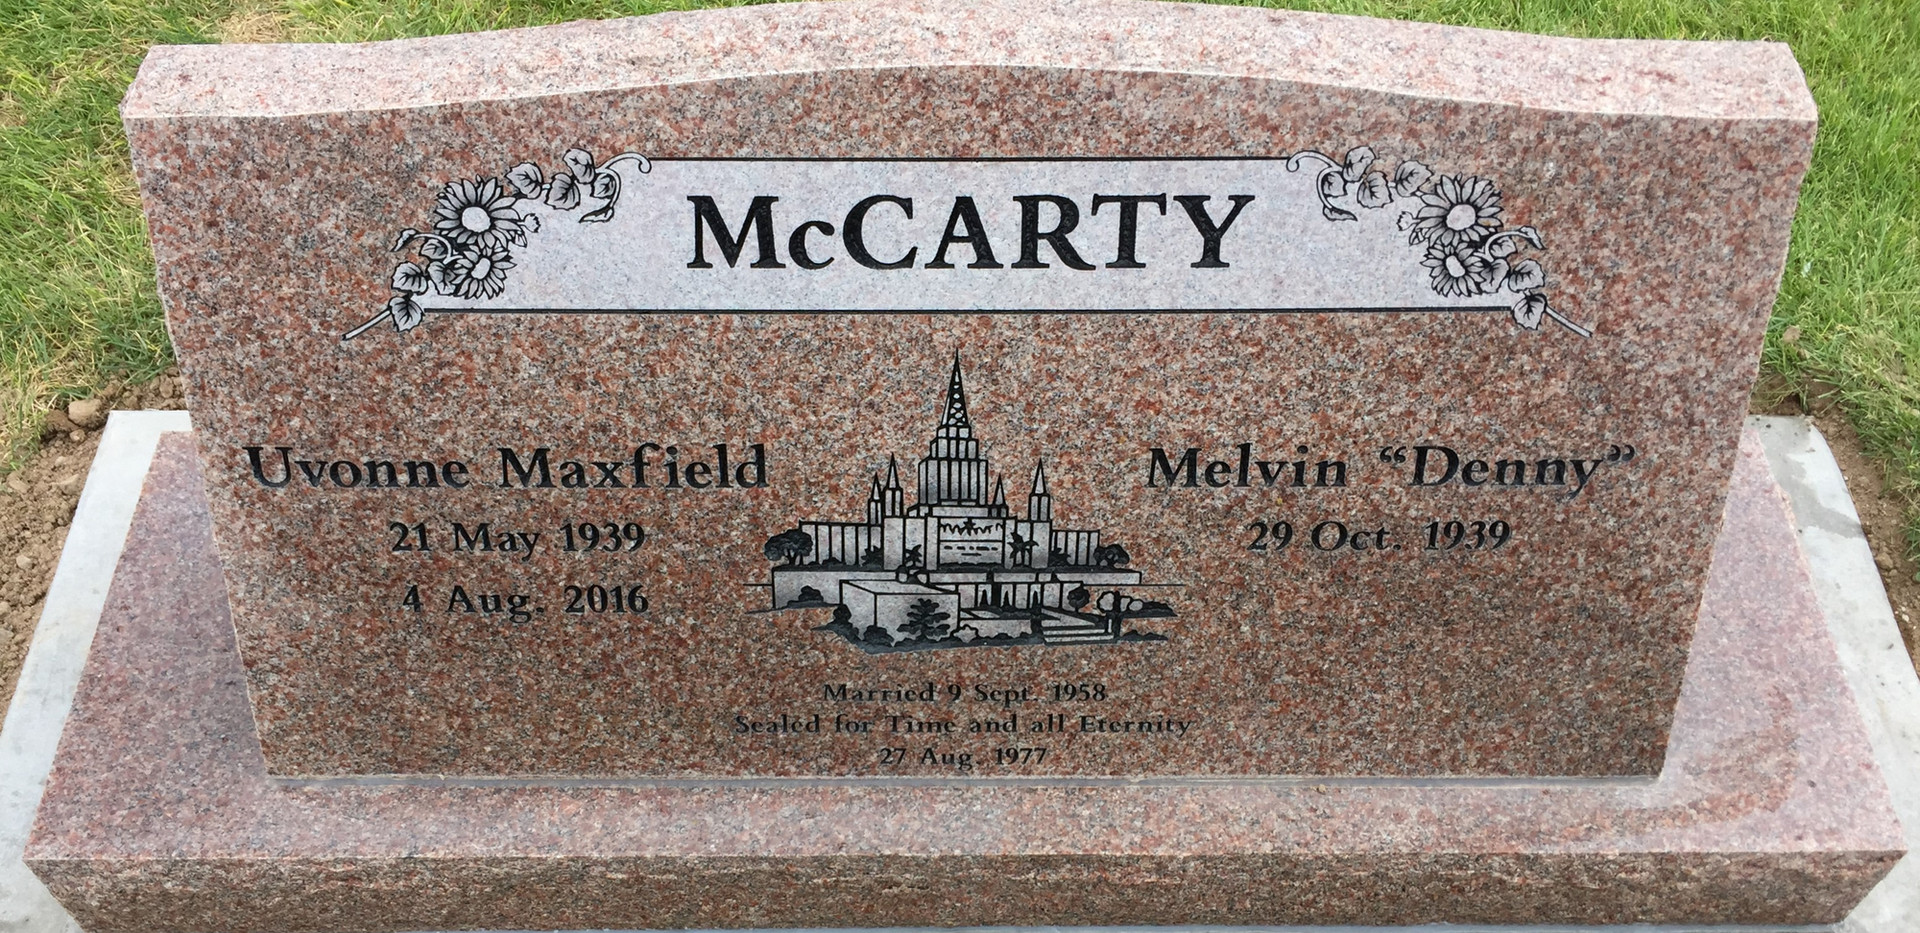 McCarty Slant Headstone